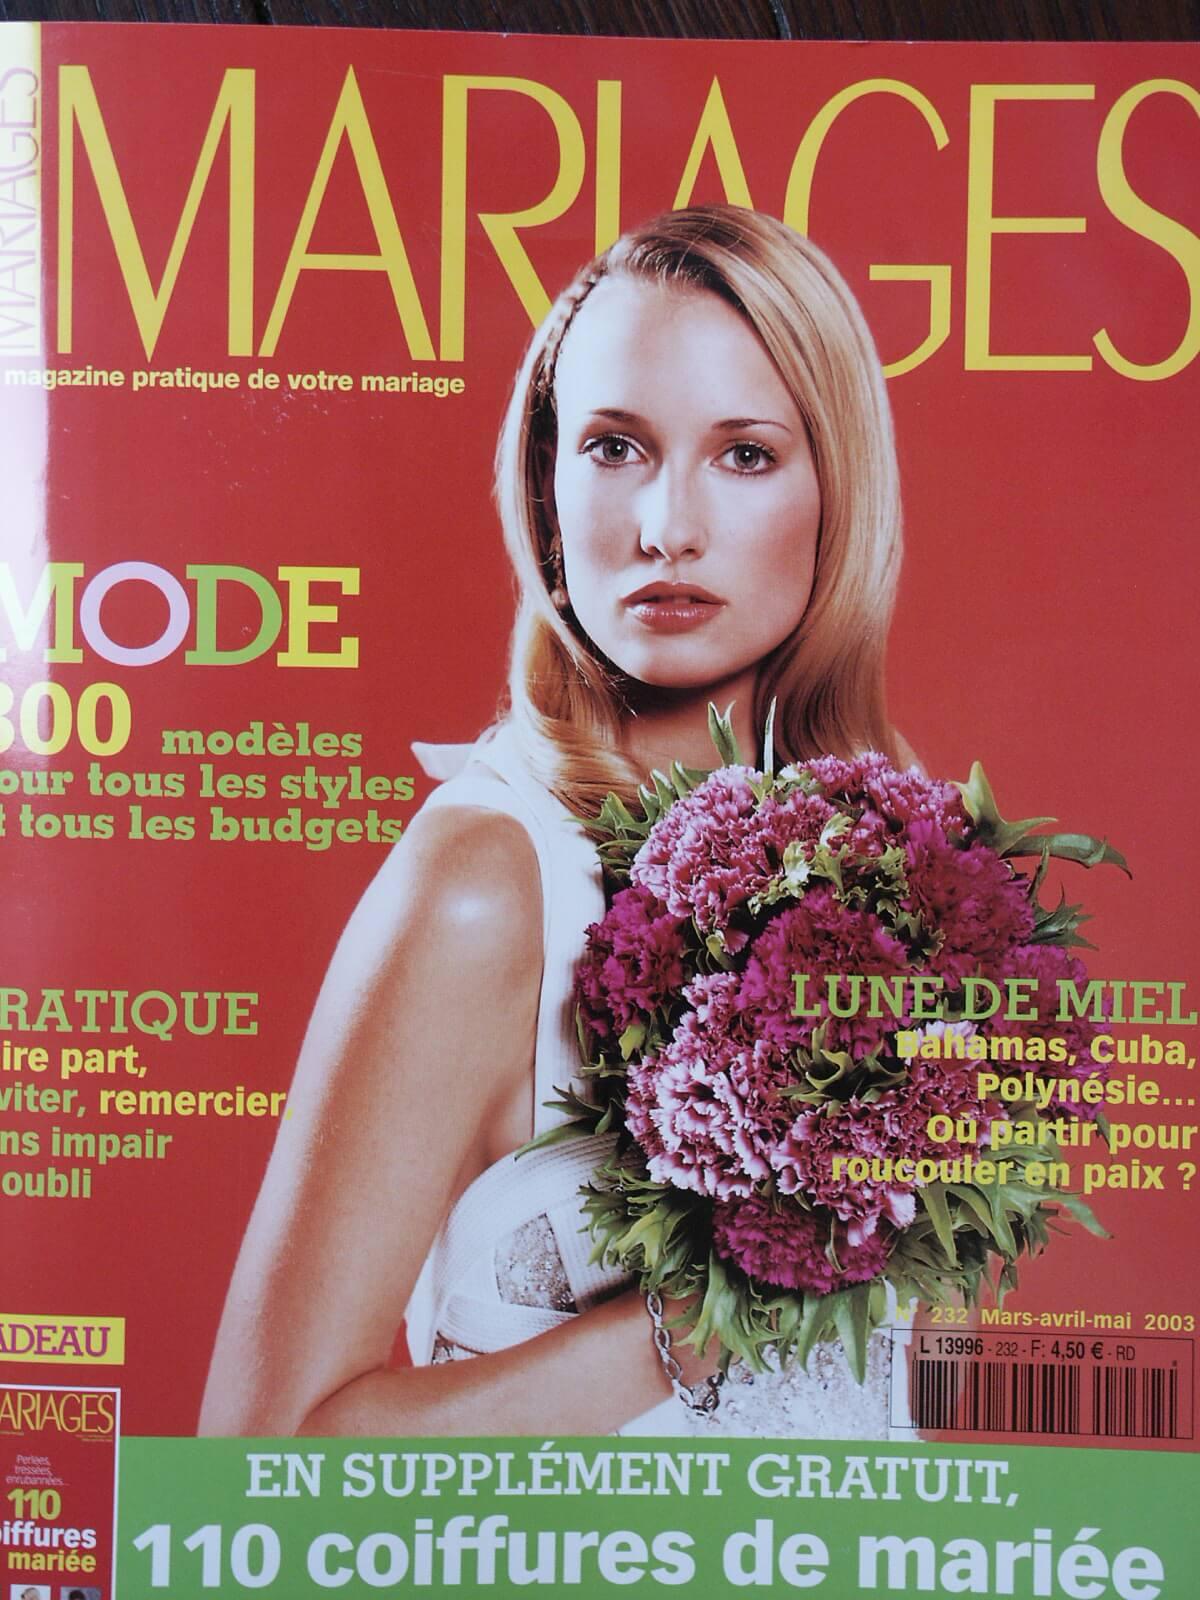 2003 Mariages - Février Avril 2003 - Couve.JPG